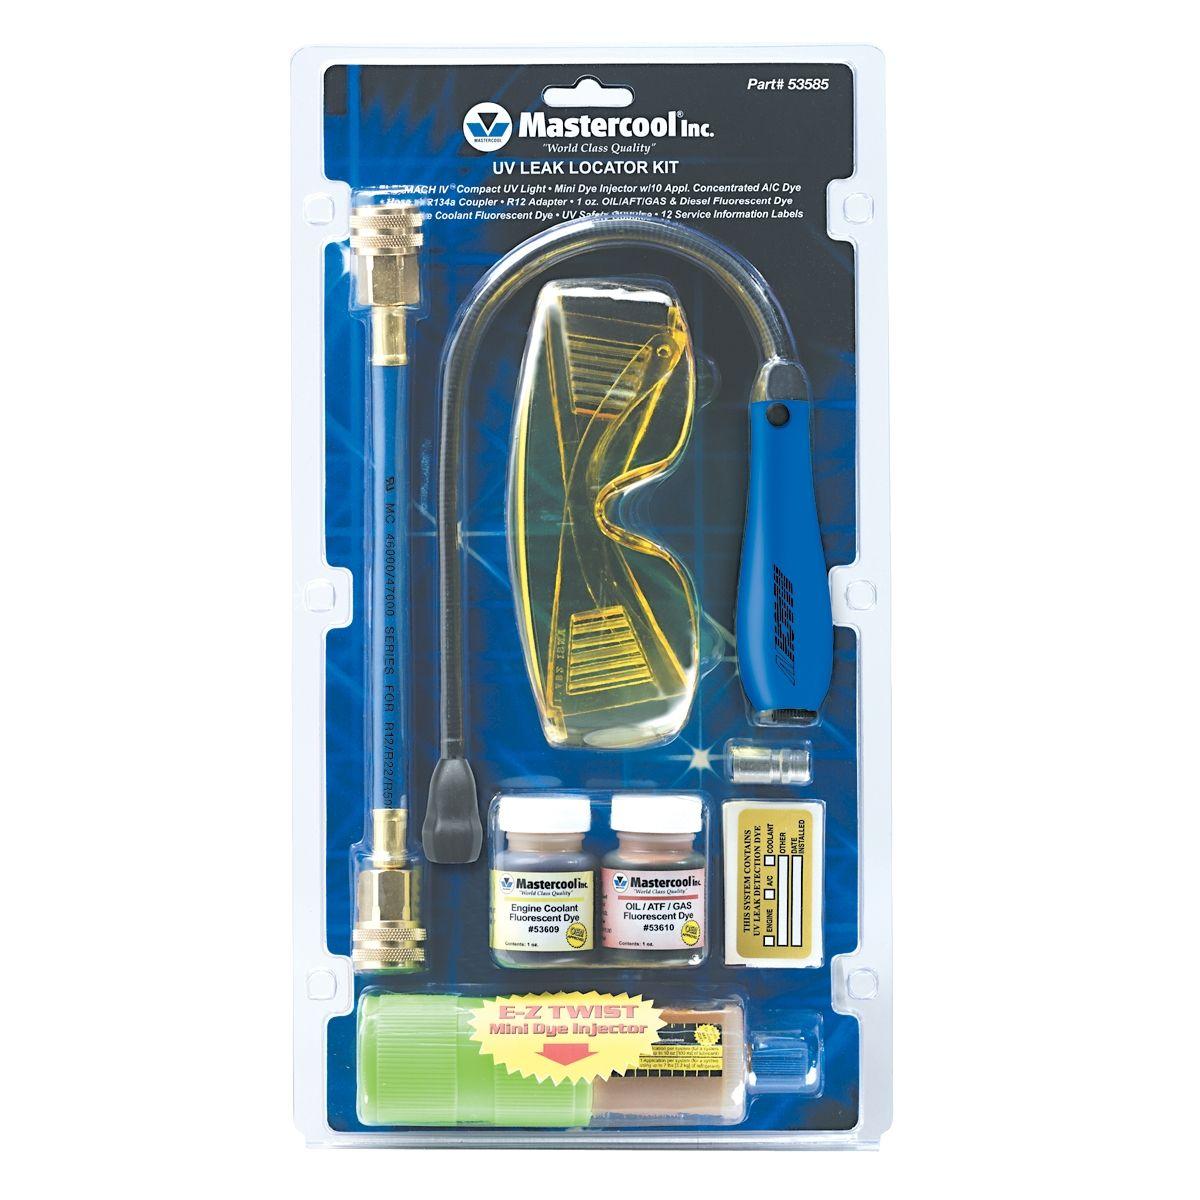 Mastercool uv leak detection kit mach iv 53585 for Used motor oil disposal walmart